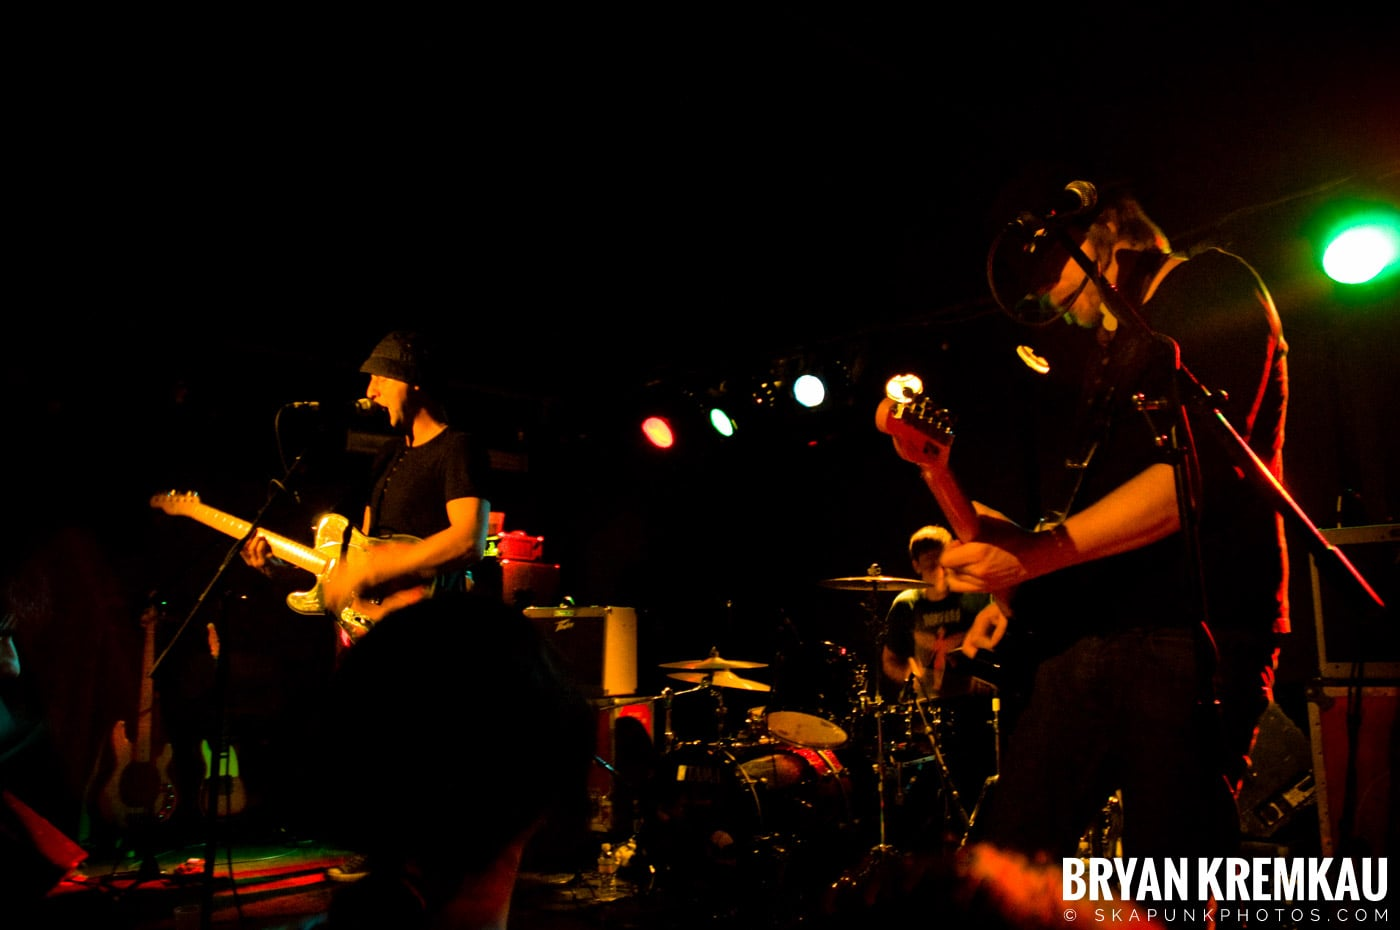 The Rifles @ Mercury Lounge, NYC - 9.24.09 (1)